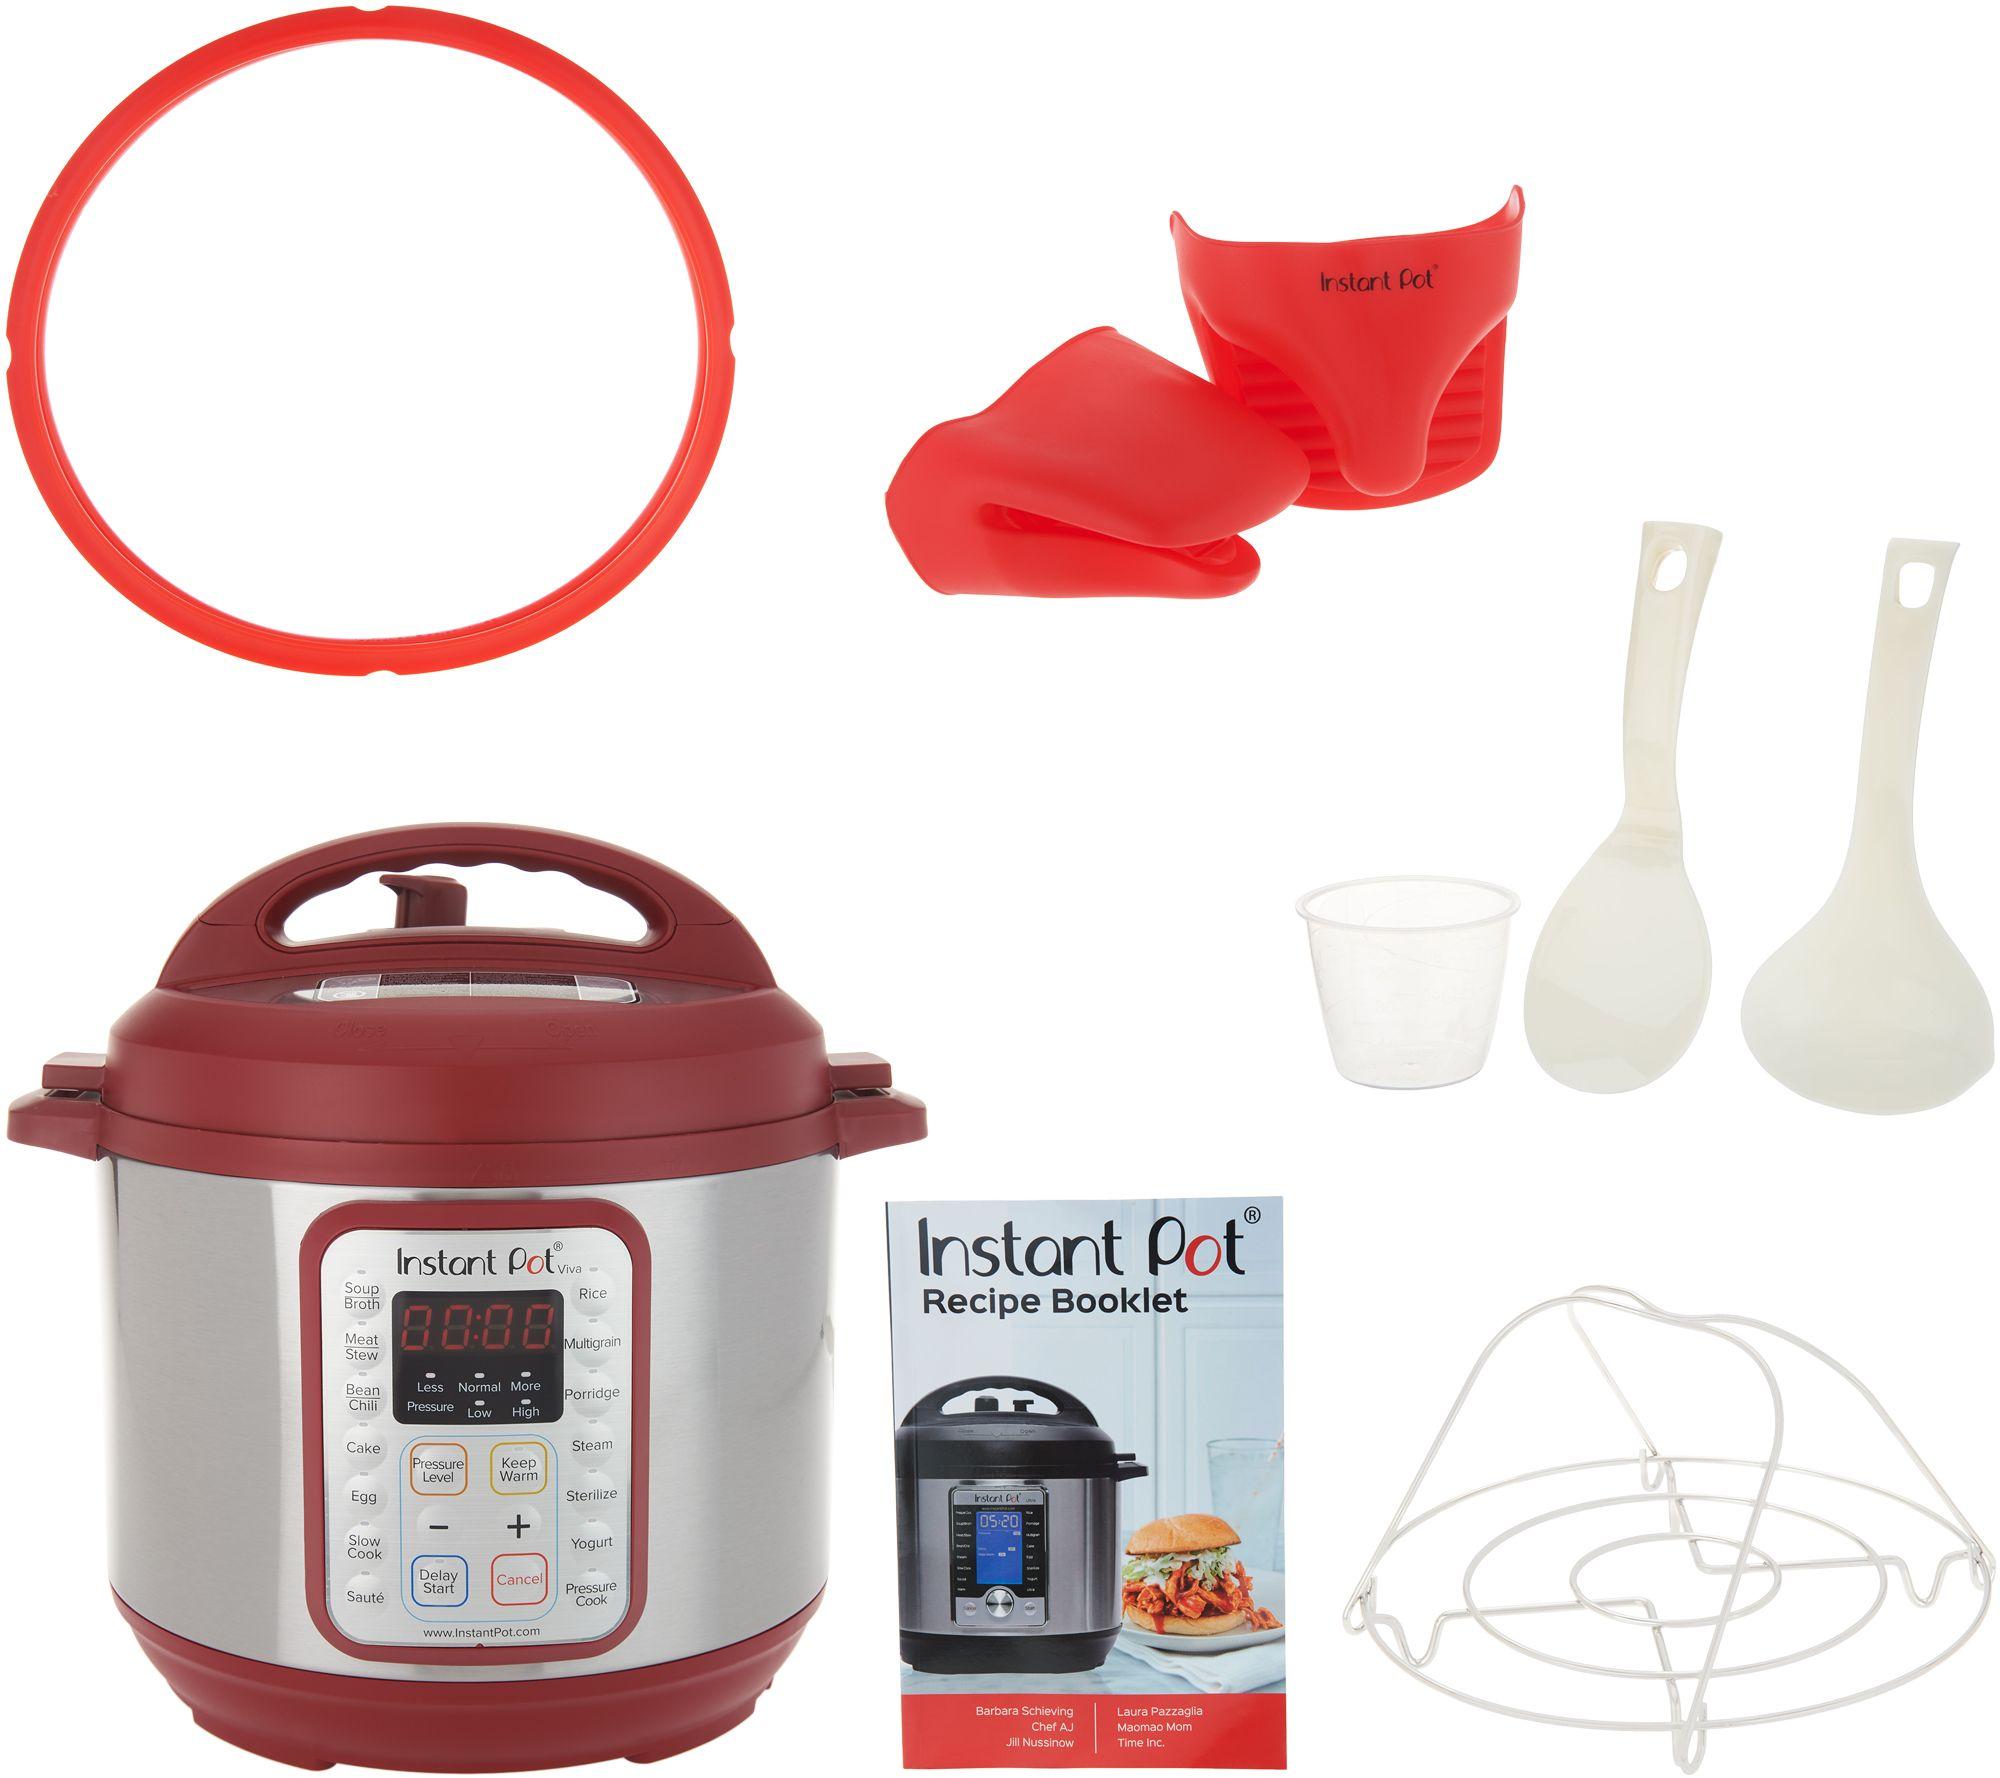 Instant Pot 6 Qt Viva 9 In 1 Digital Pressure Cooker W